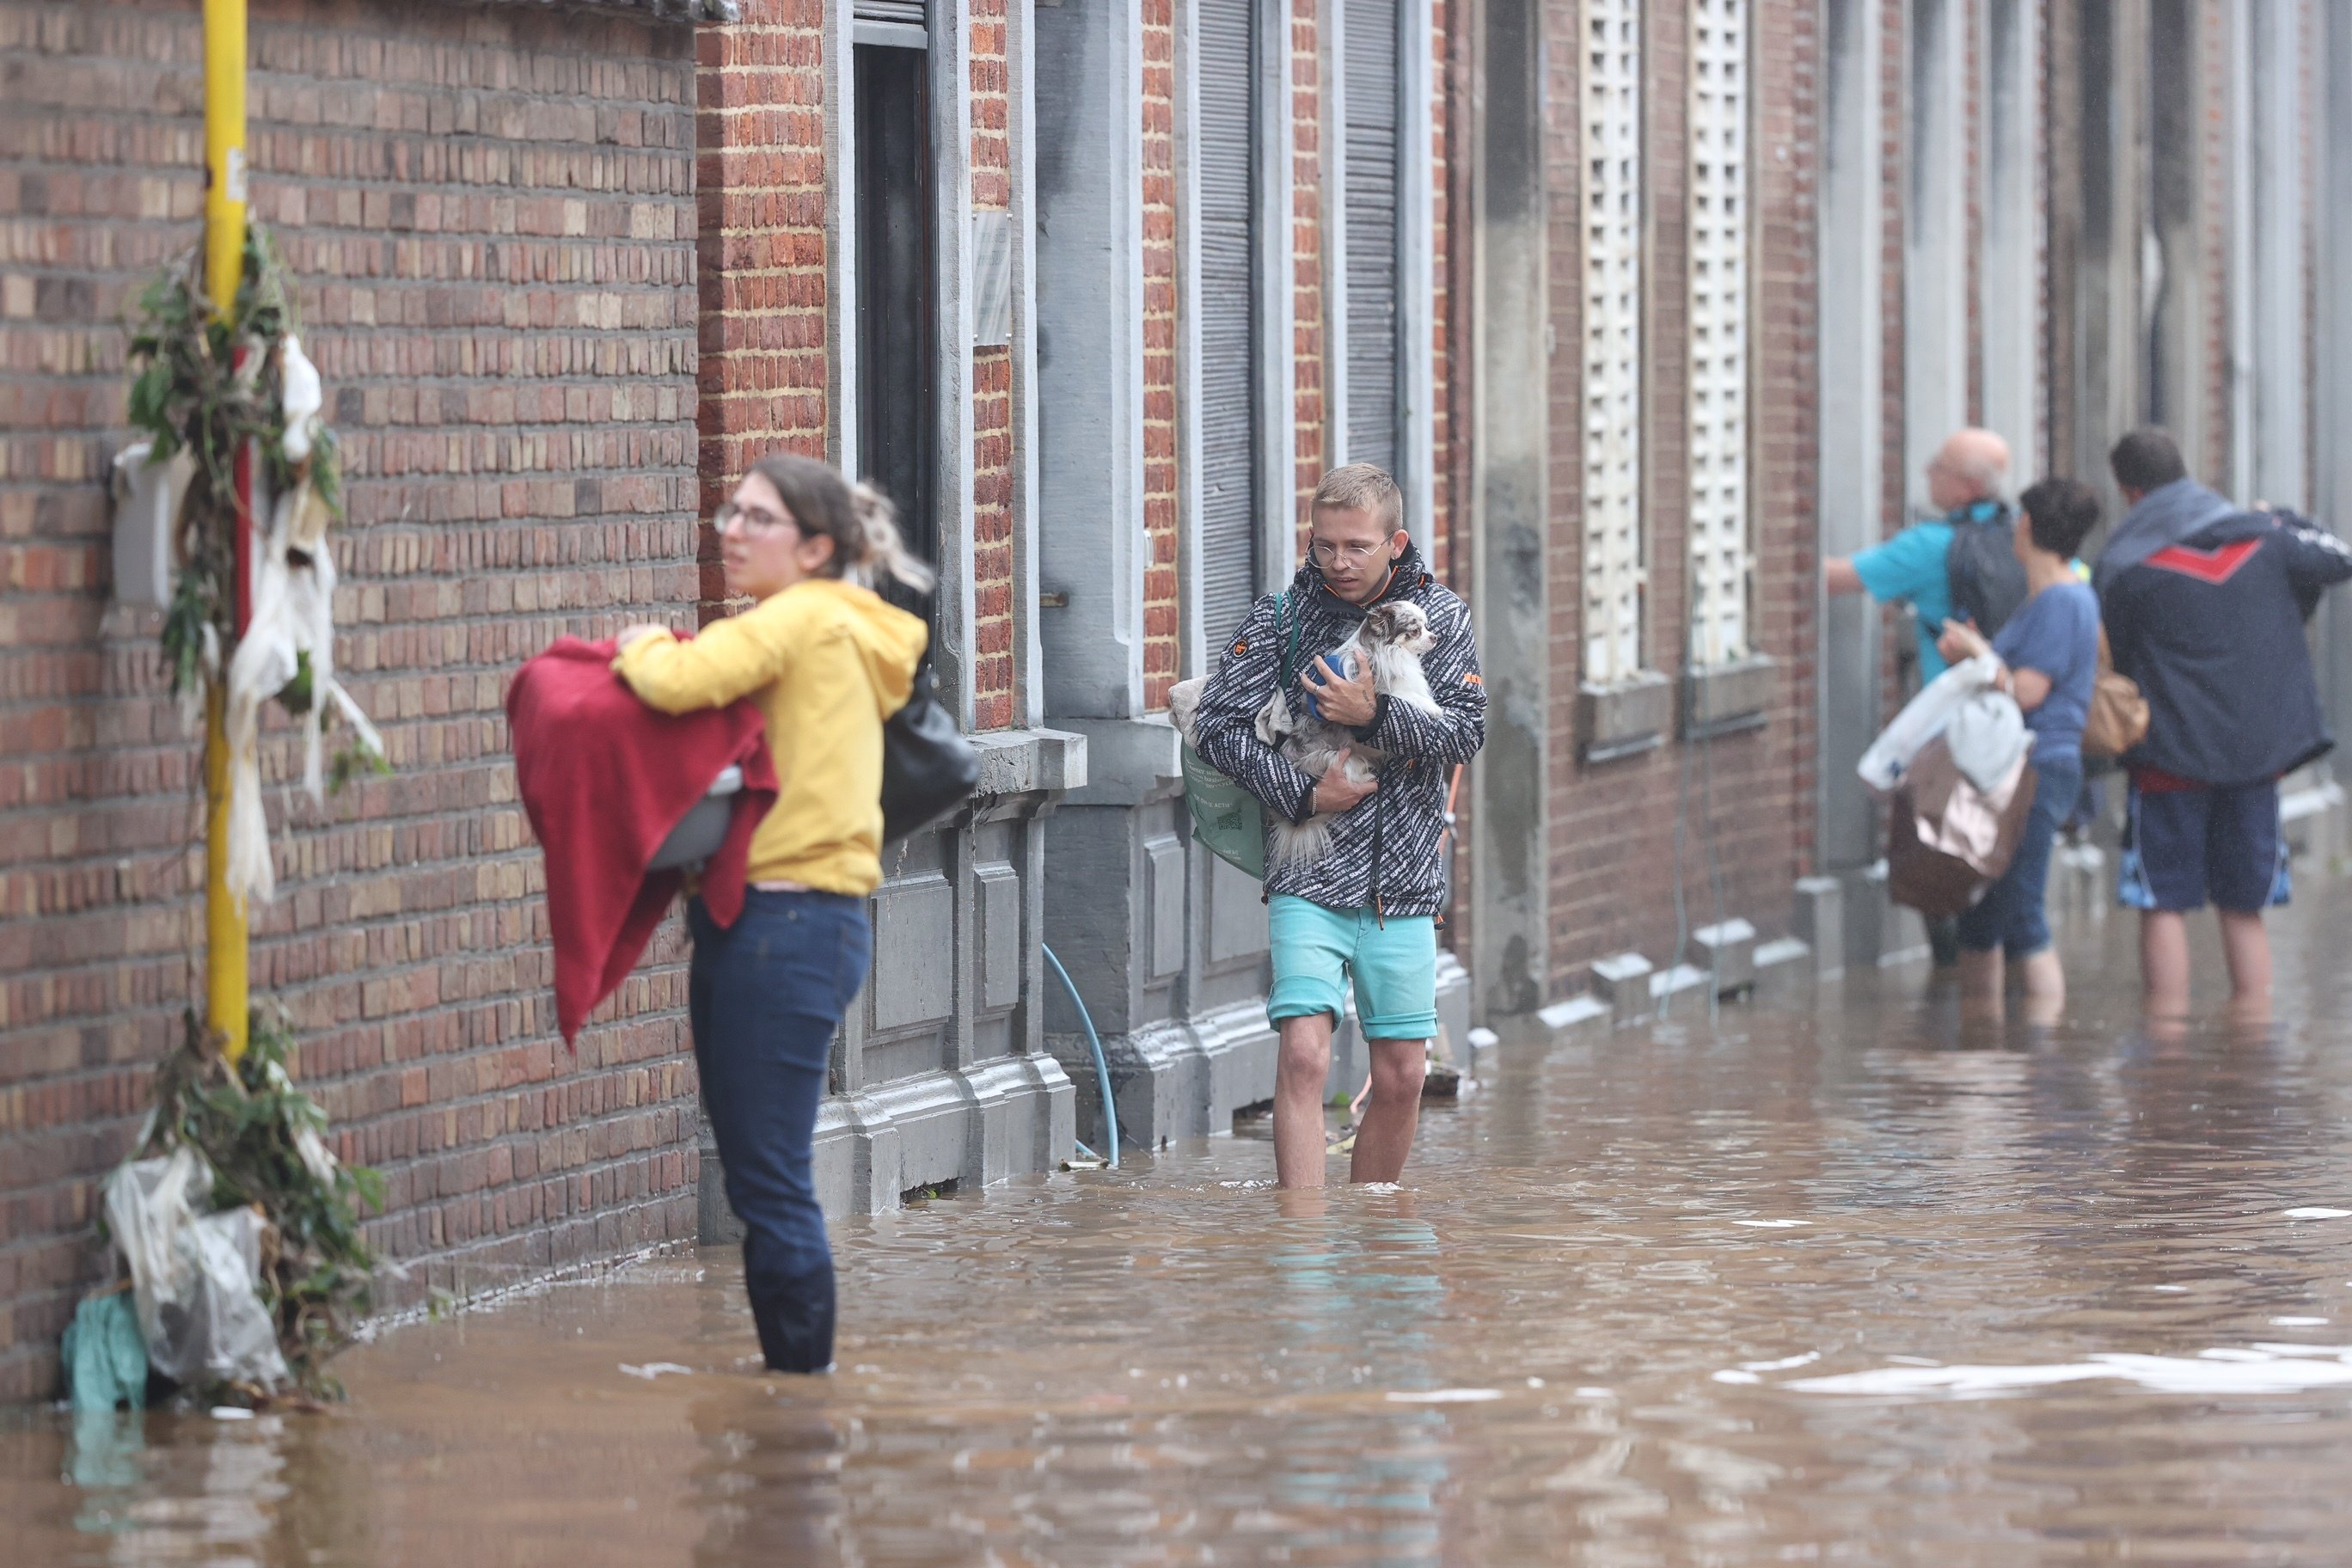 Flooded streets in Belgium as heavy rain in the region